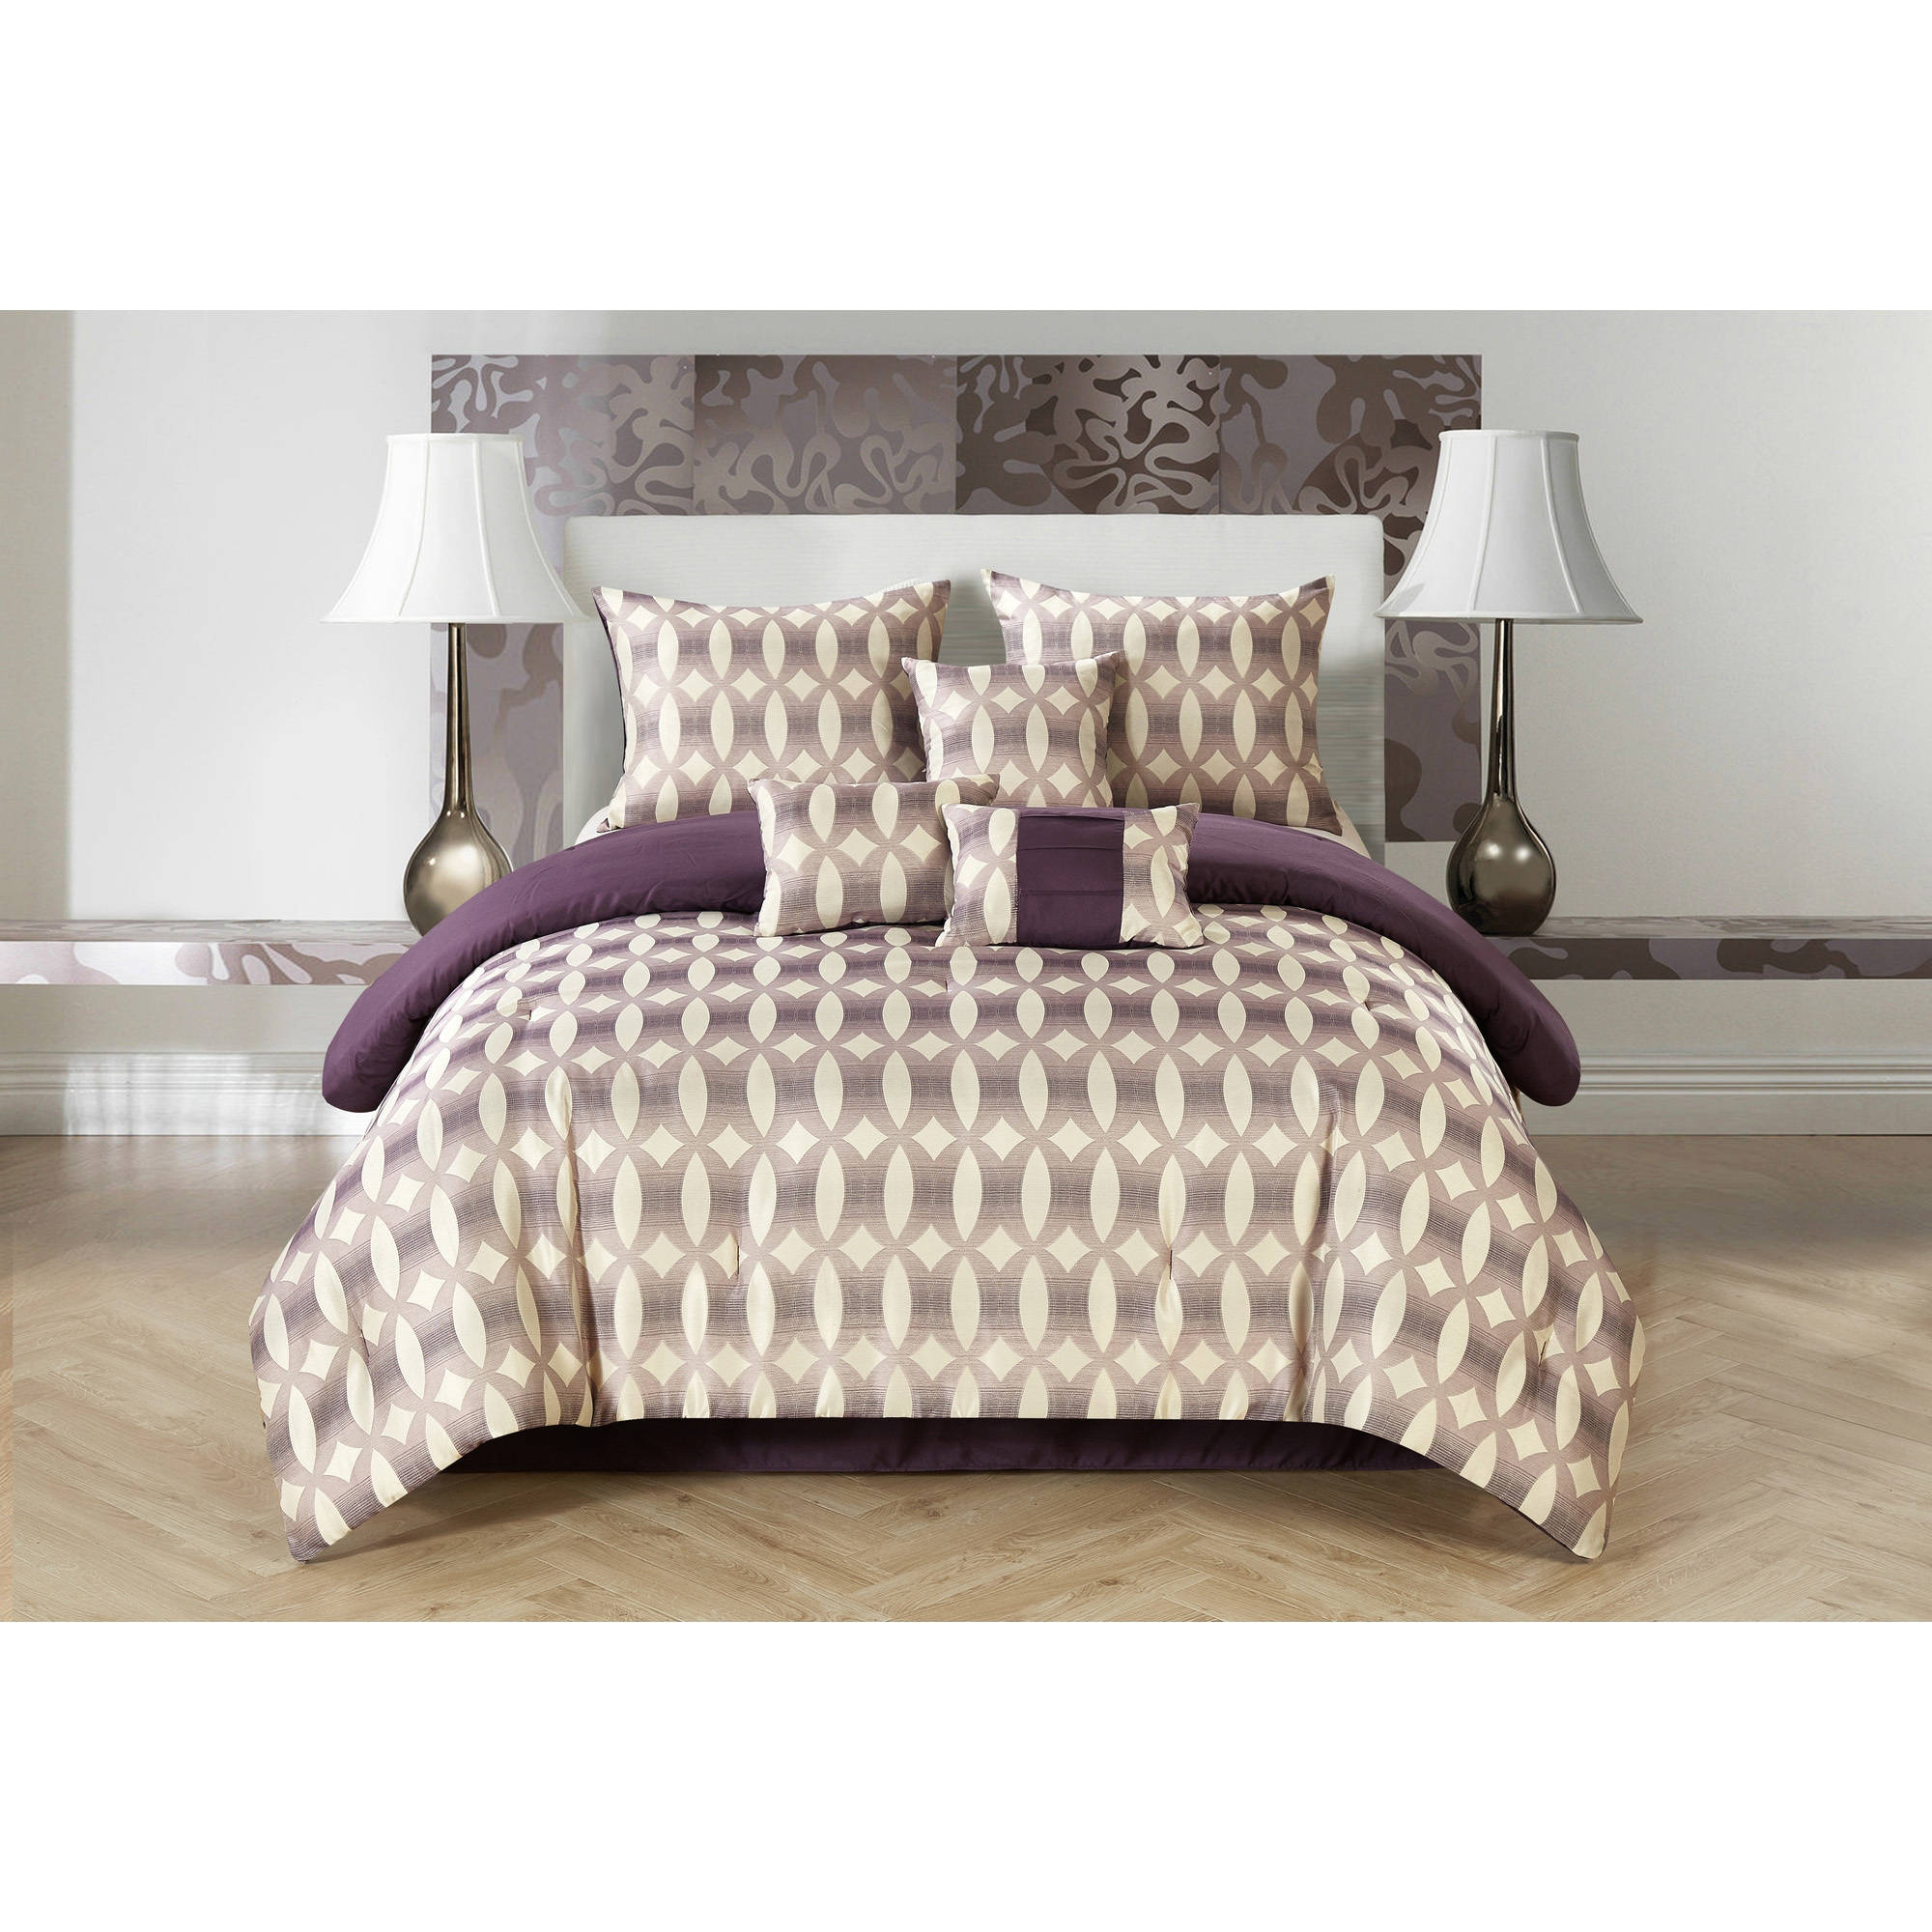 CASA Bentham Jacquard 7-Piece Bedding Comforter Set by Idea Nuova